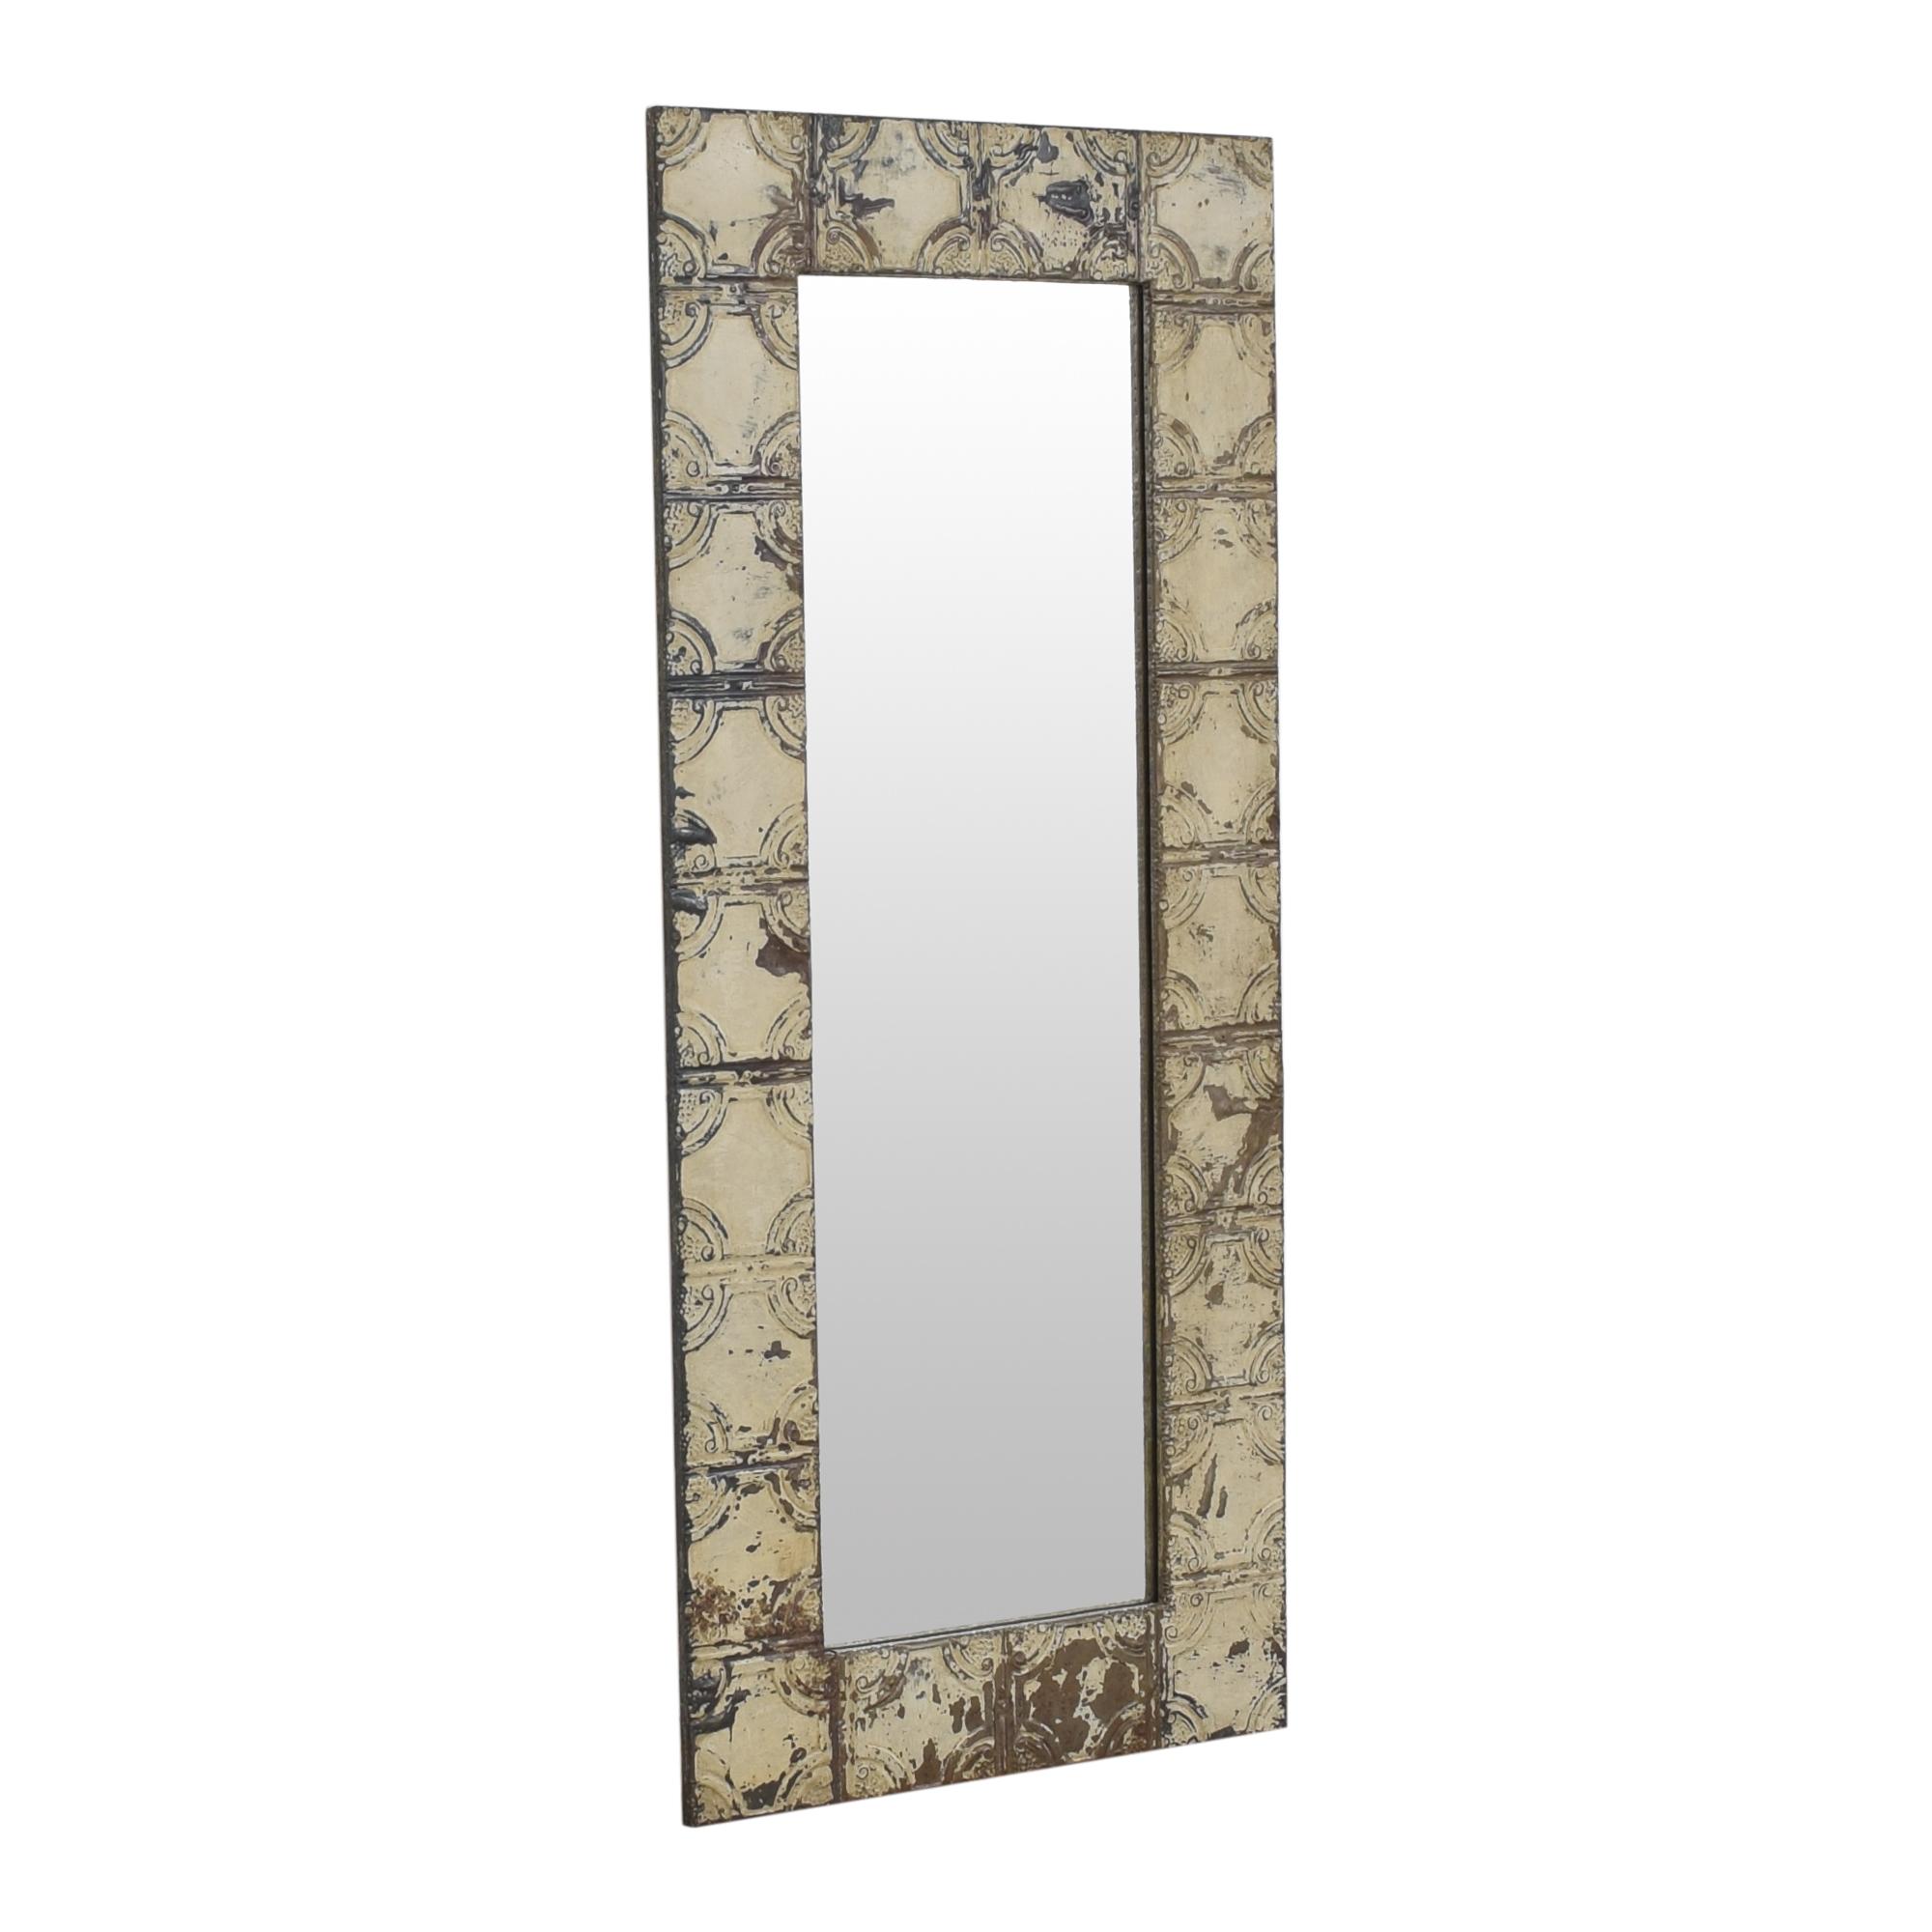 Vintage Style Floor Mirror Decor